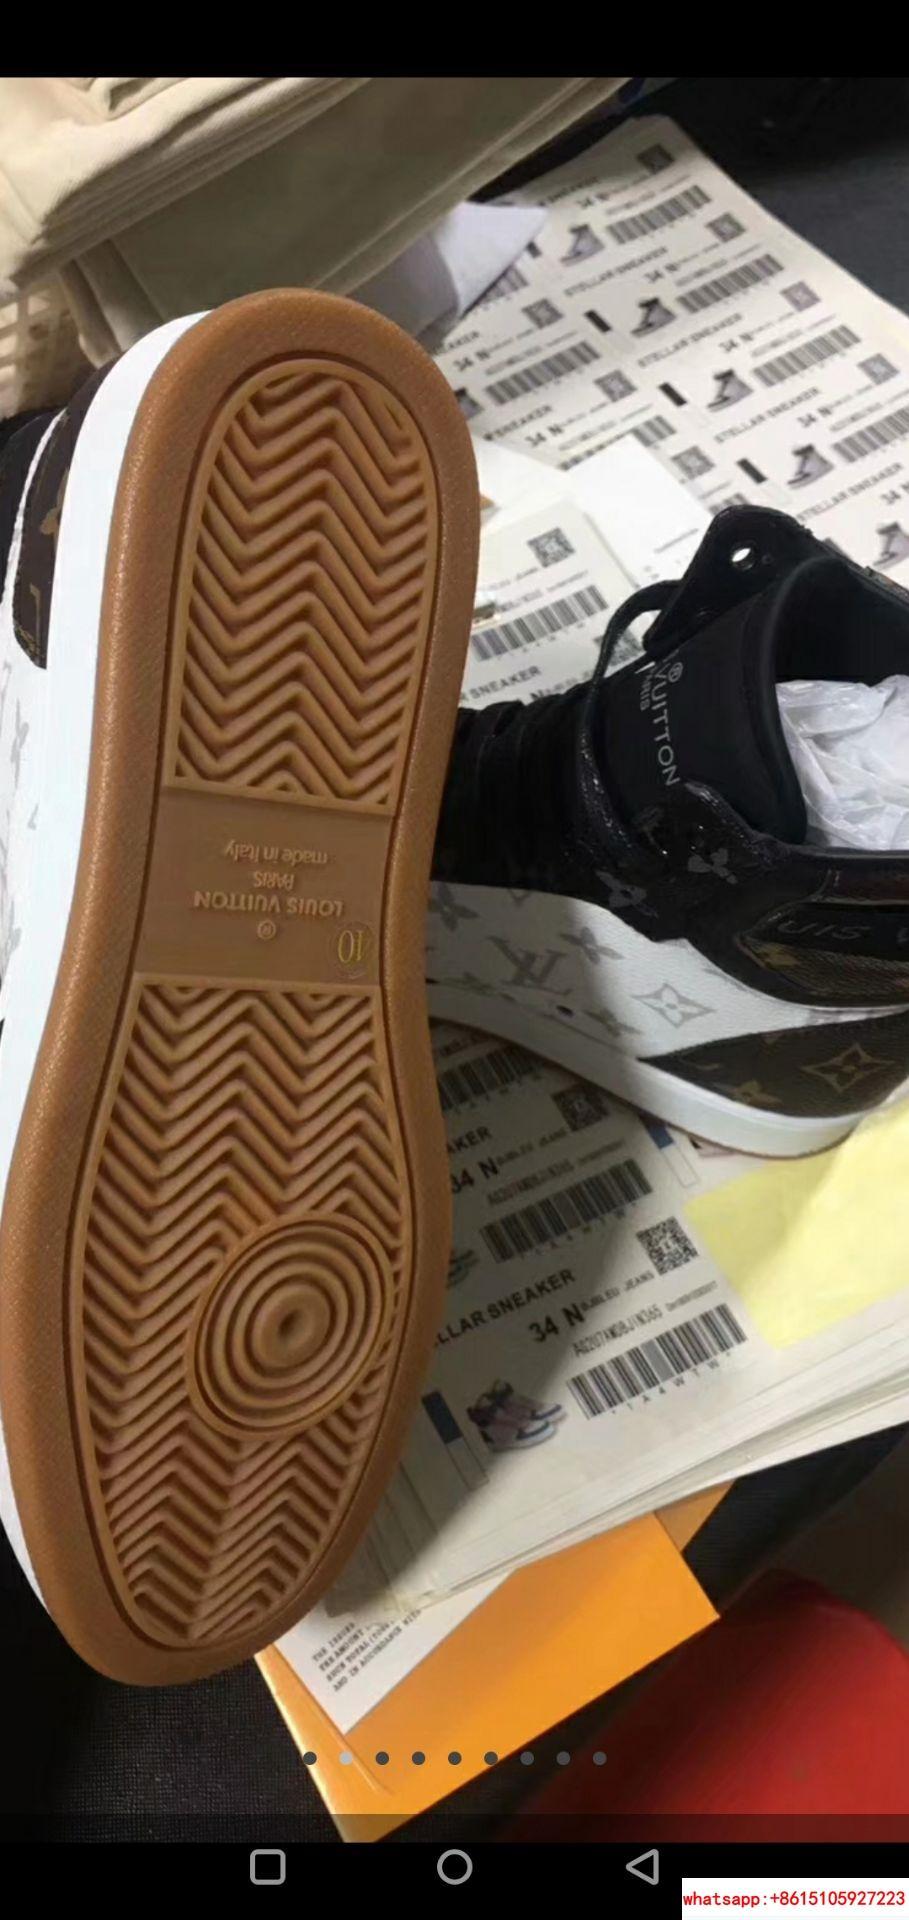 rivoli sneaker boot Monogram canvas  1A44VV    sneaker    shoes  7